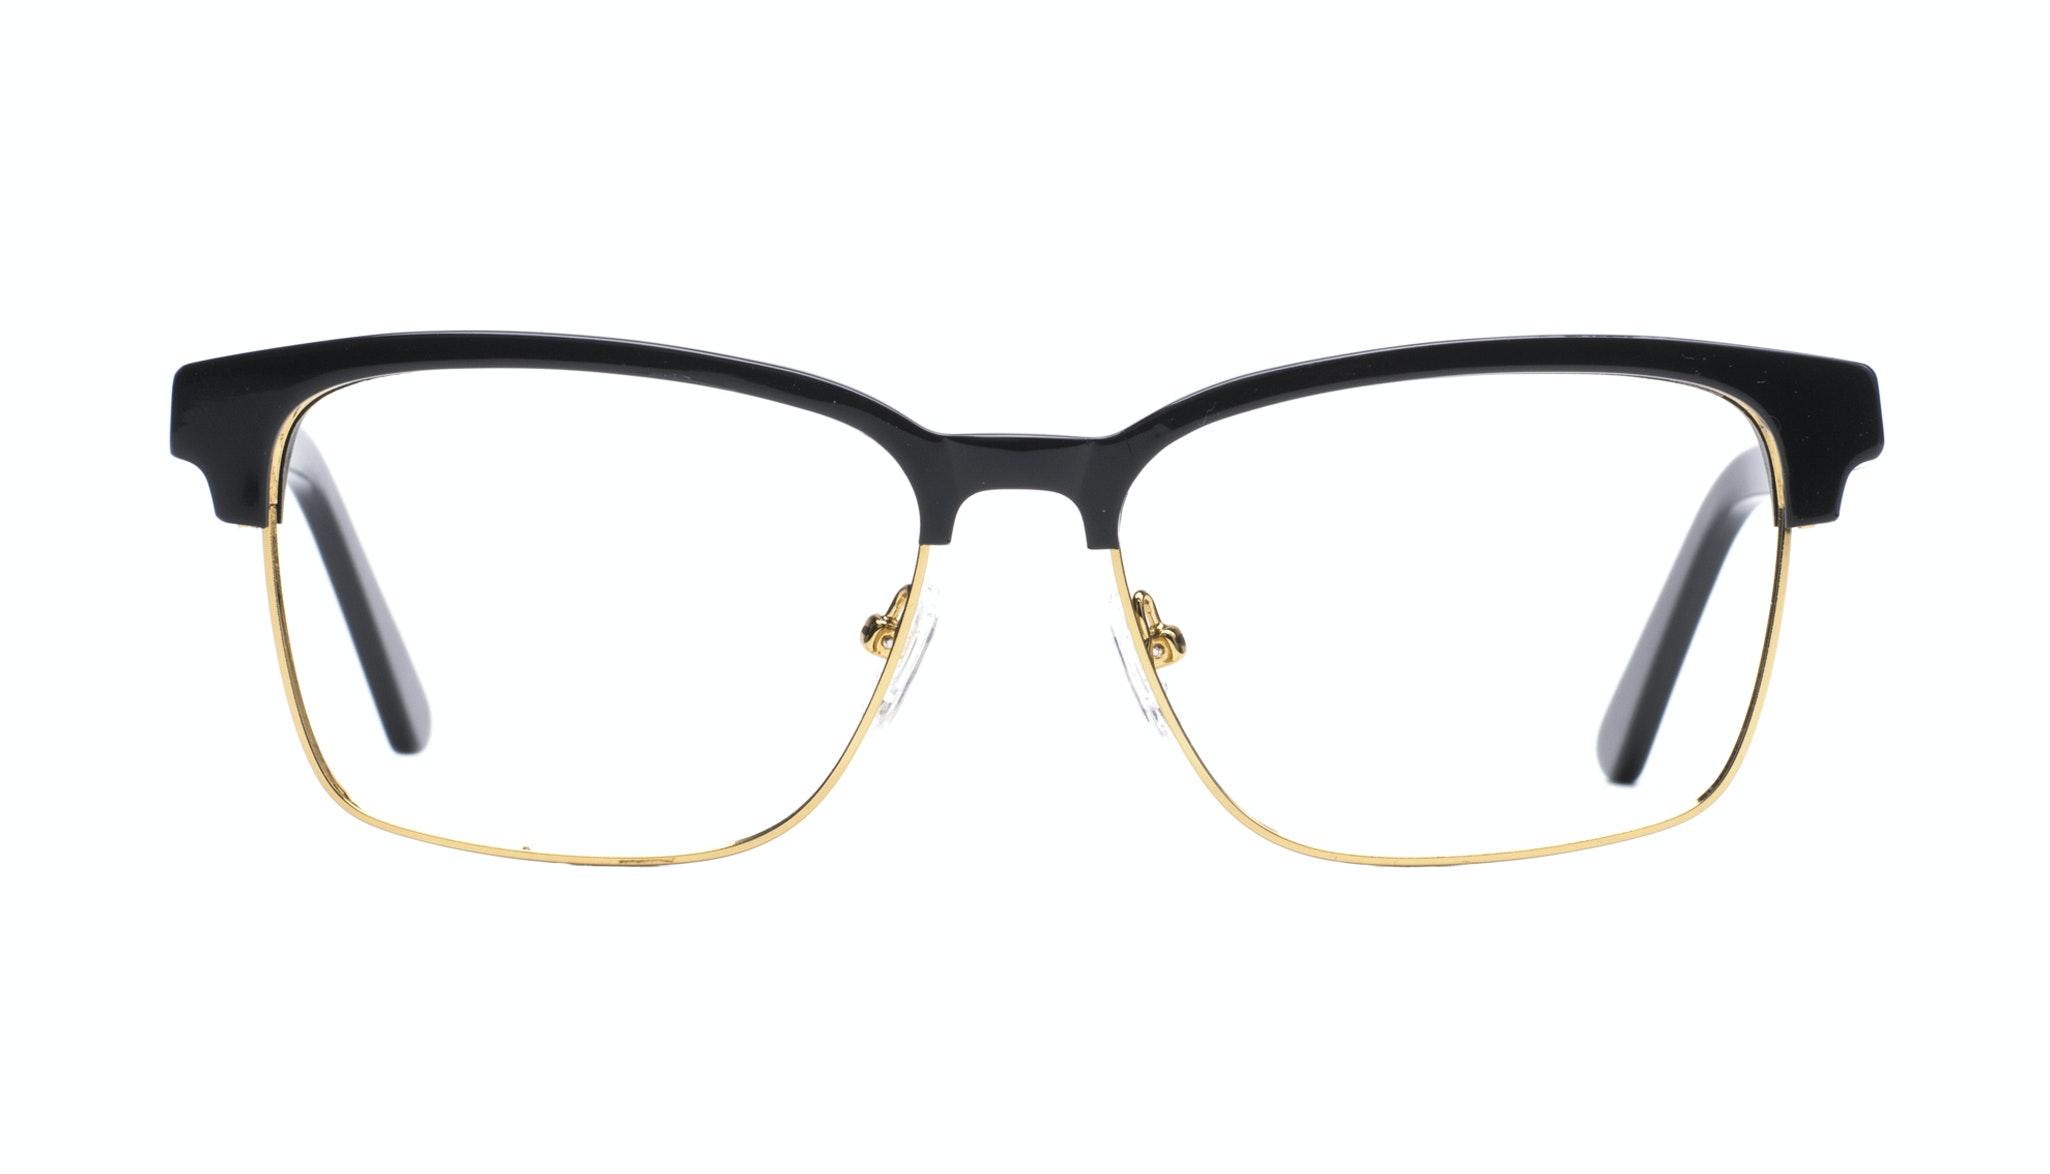 Affordable Fashion Glasses Rectangle Square Eyeglasses Men Gallery Black Front